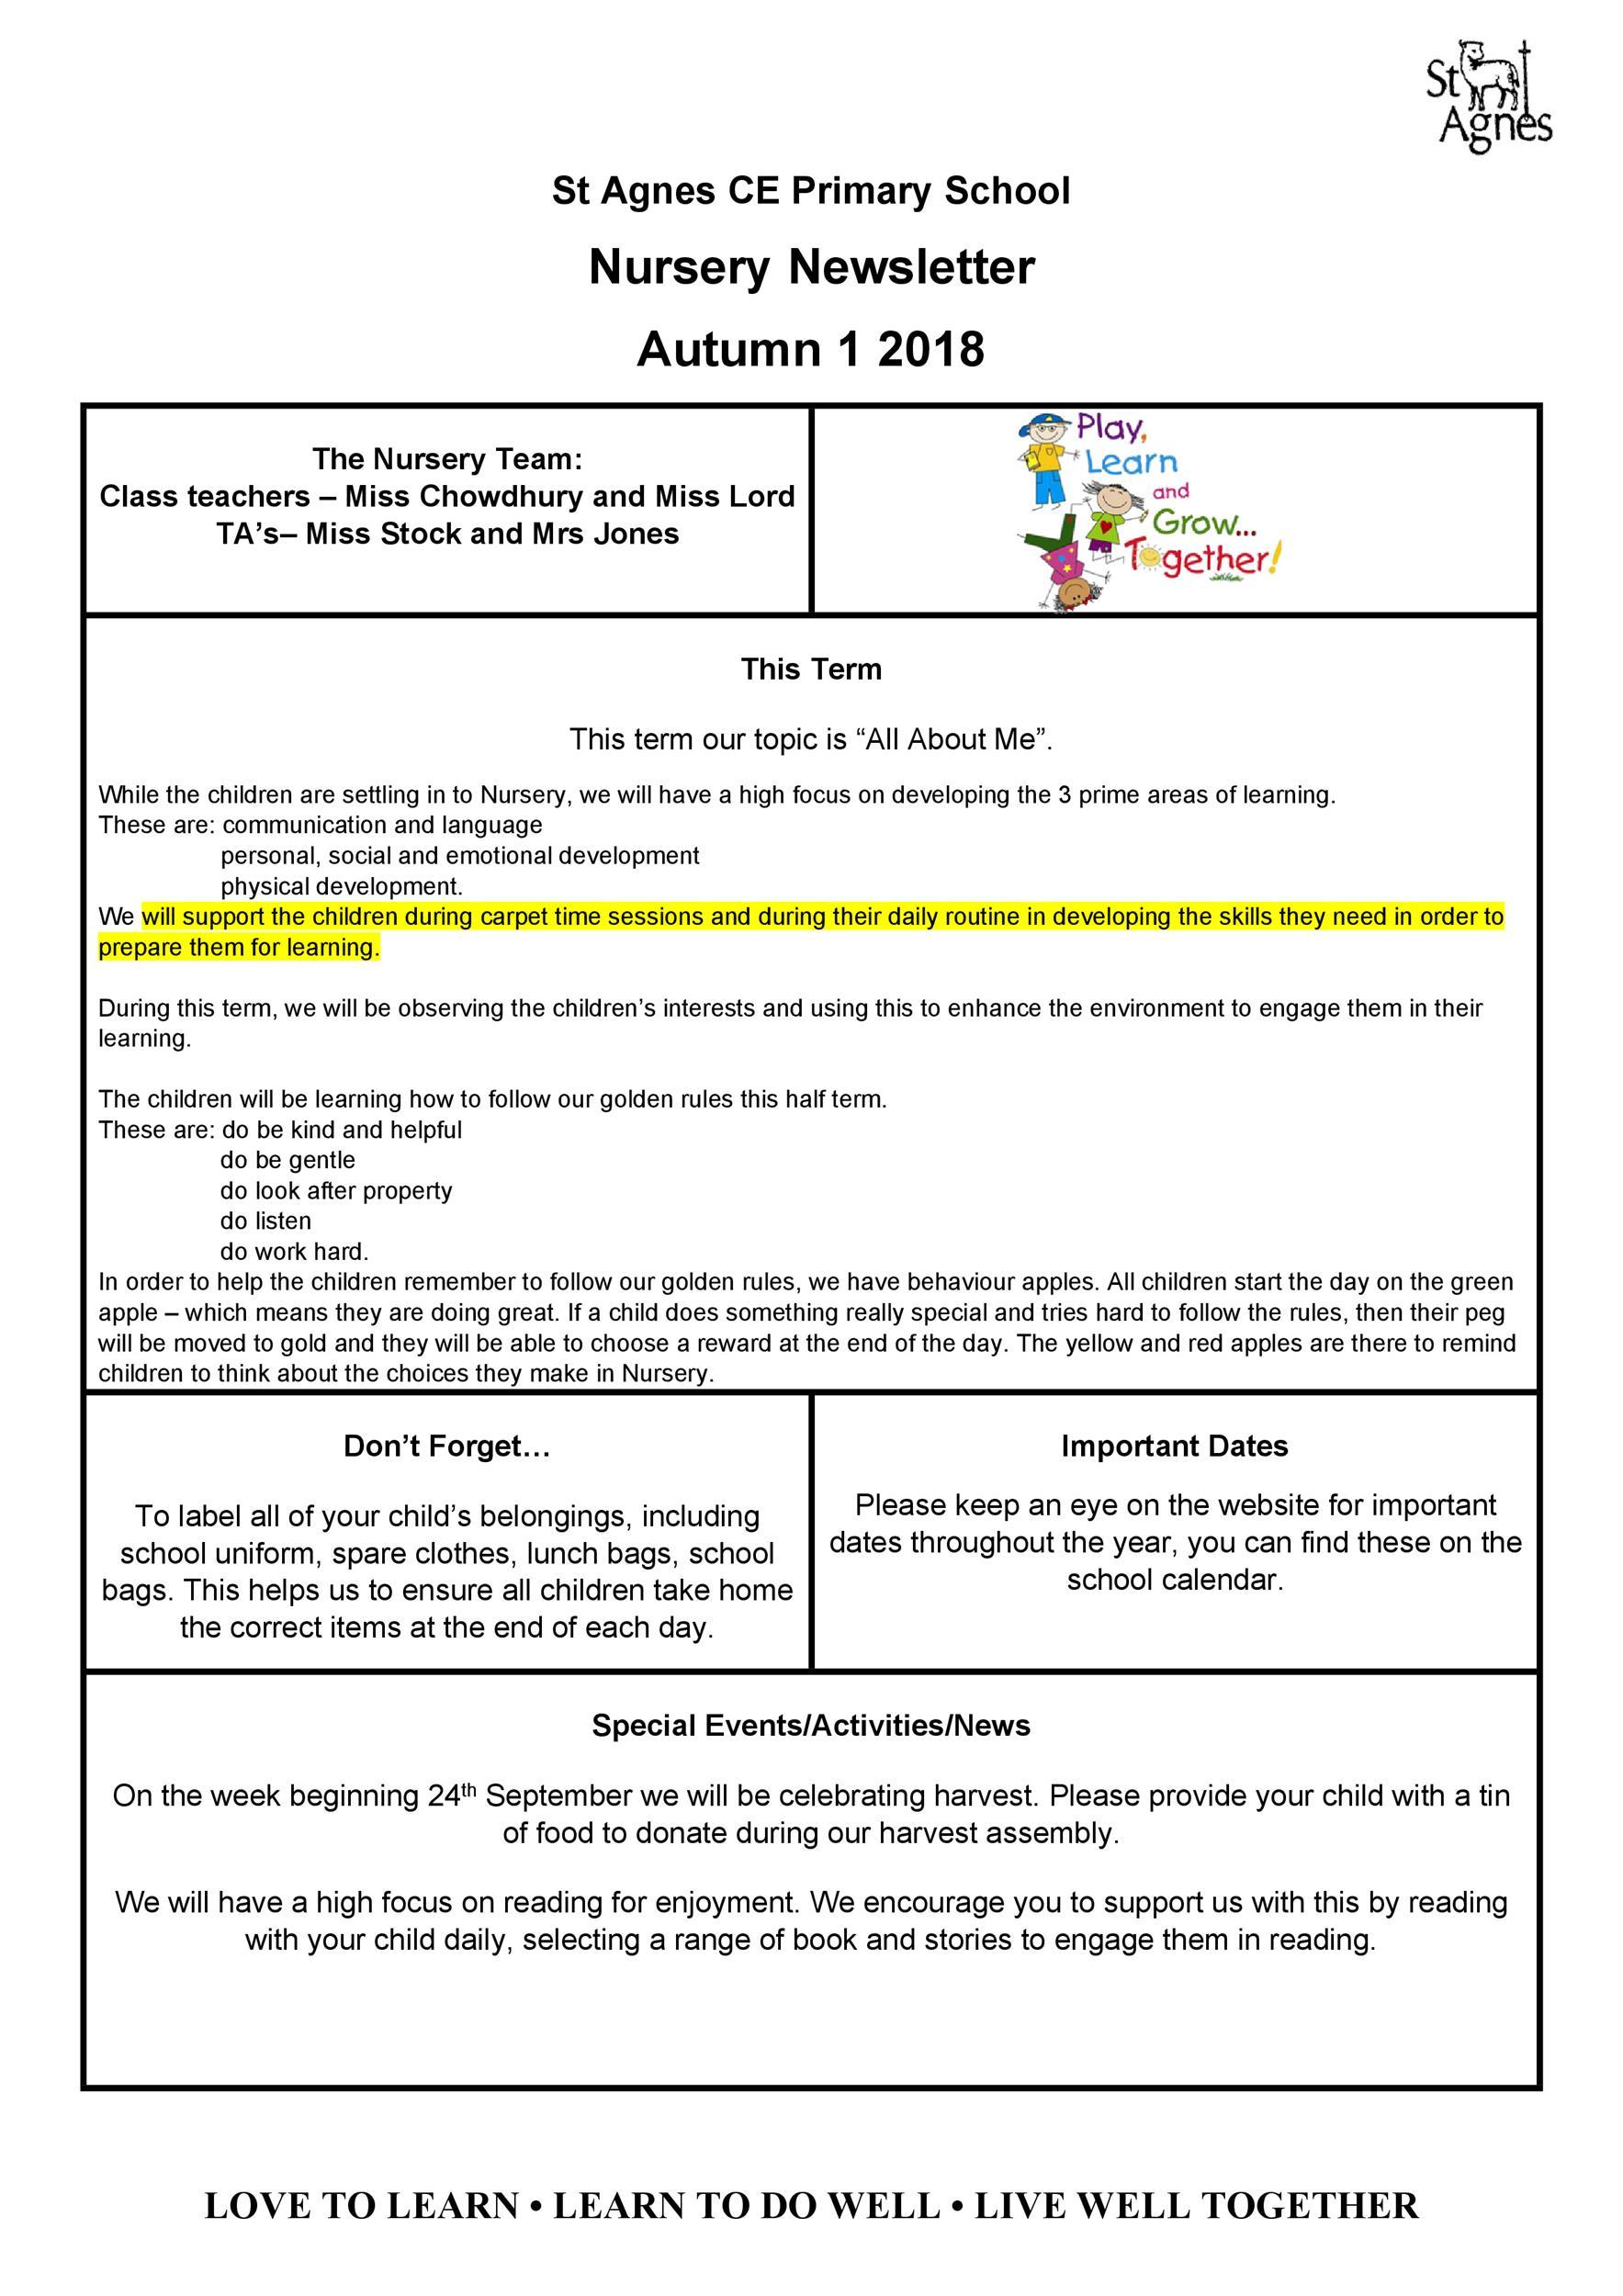 Free preschool newsletter template 05